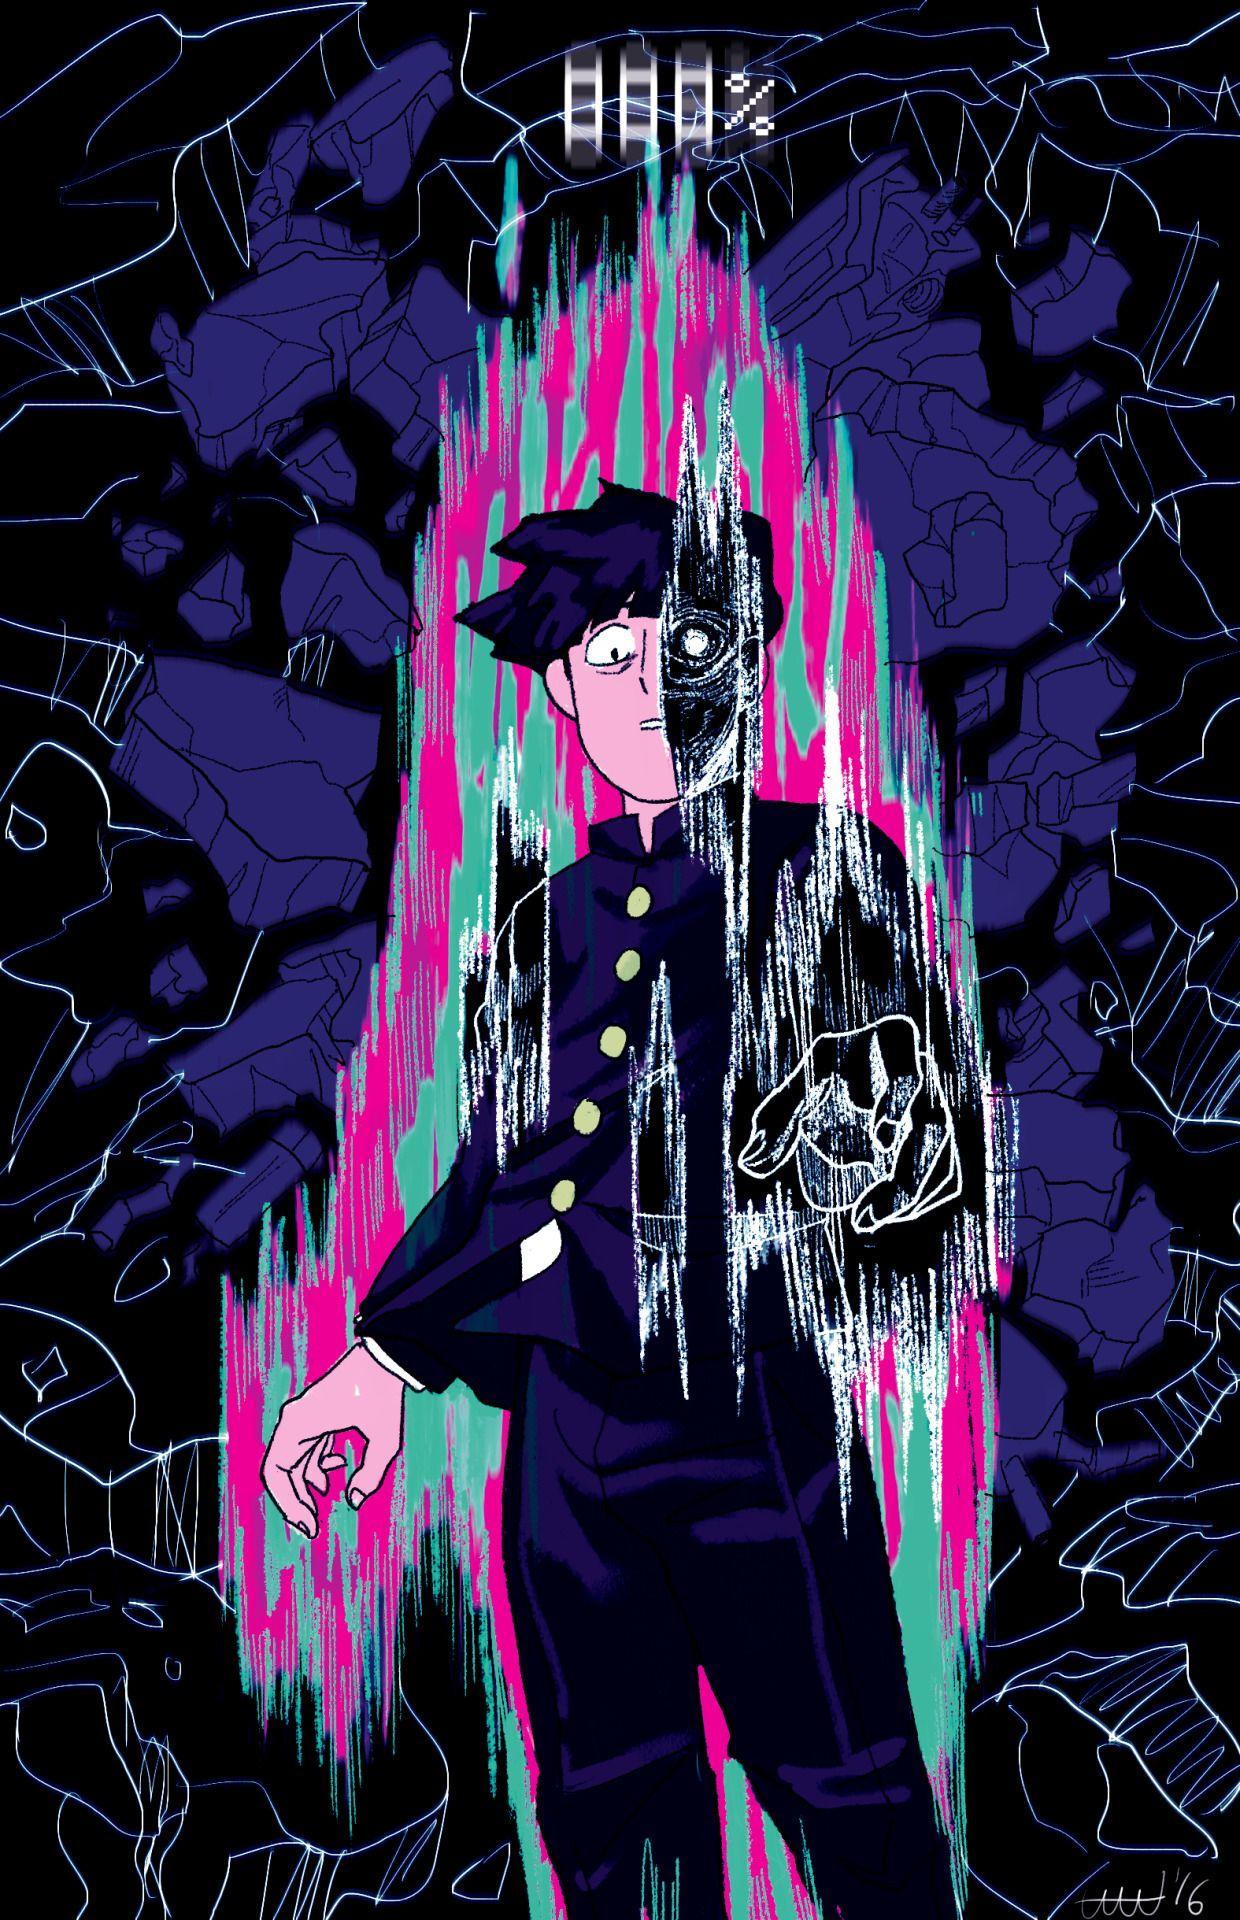 Mob Psycho 100 Shigeo Kageyama Mob Psycho 100 Anime Artwork